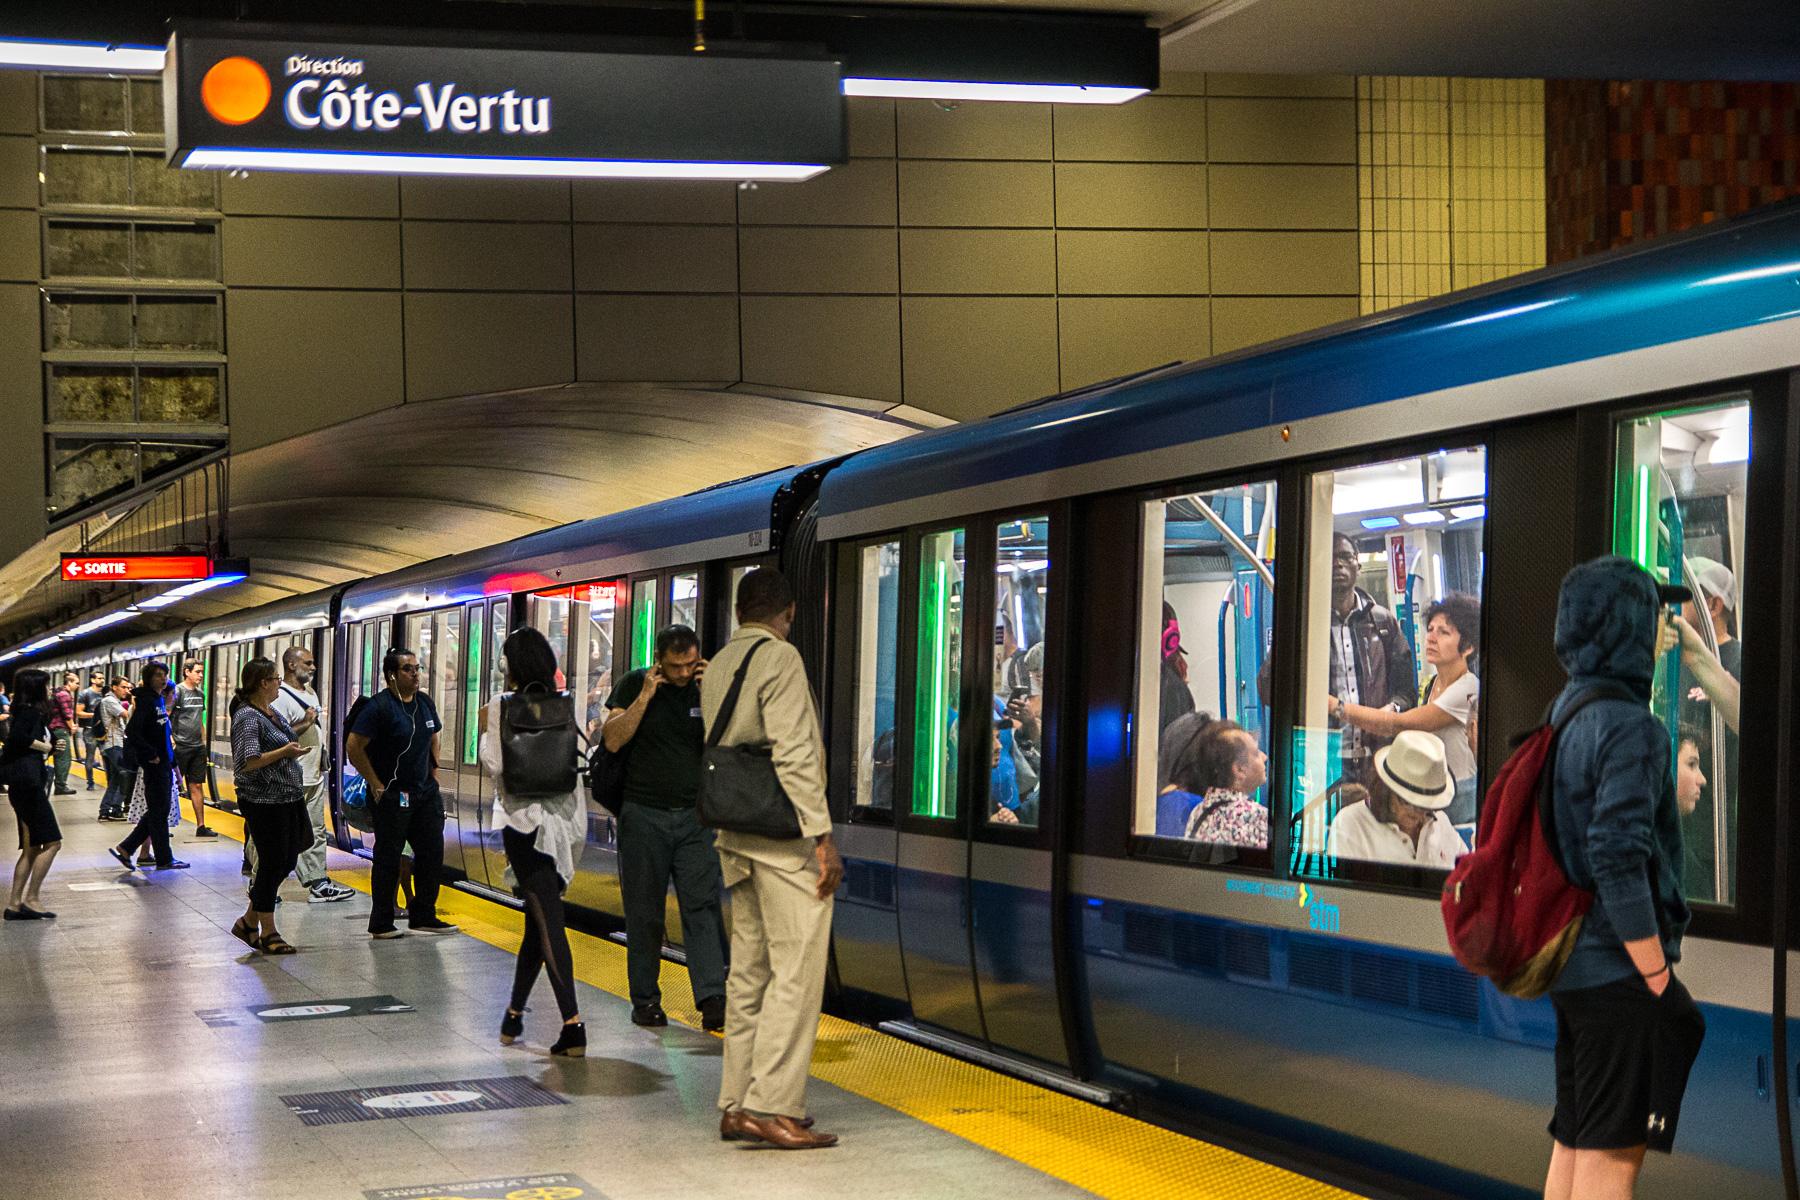 La rénovation du métro Vendôme va bon train, assure la STM